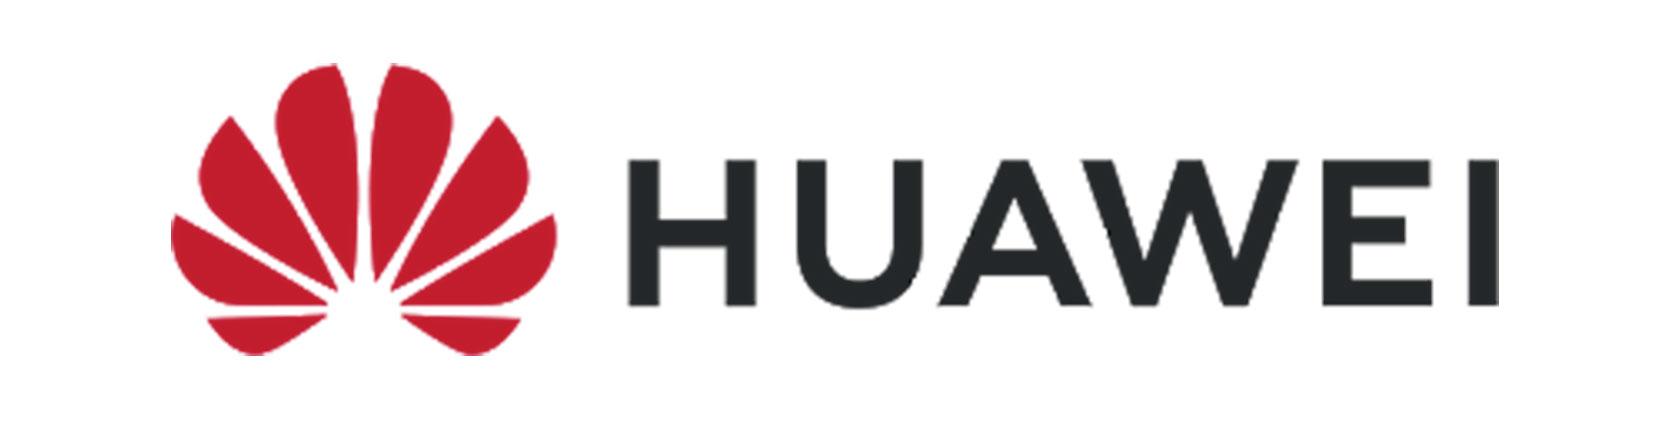 https://res.cloudinary.com/androidwedakarayo/image/upload/v1601695310/huawei-logo_wwonss.jpg